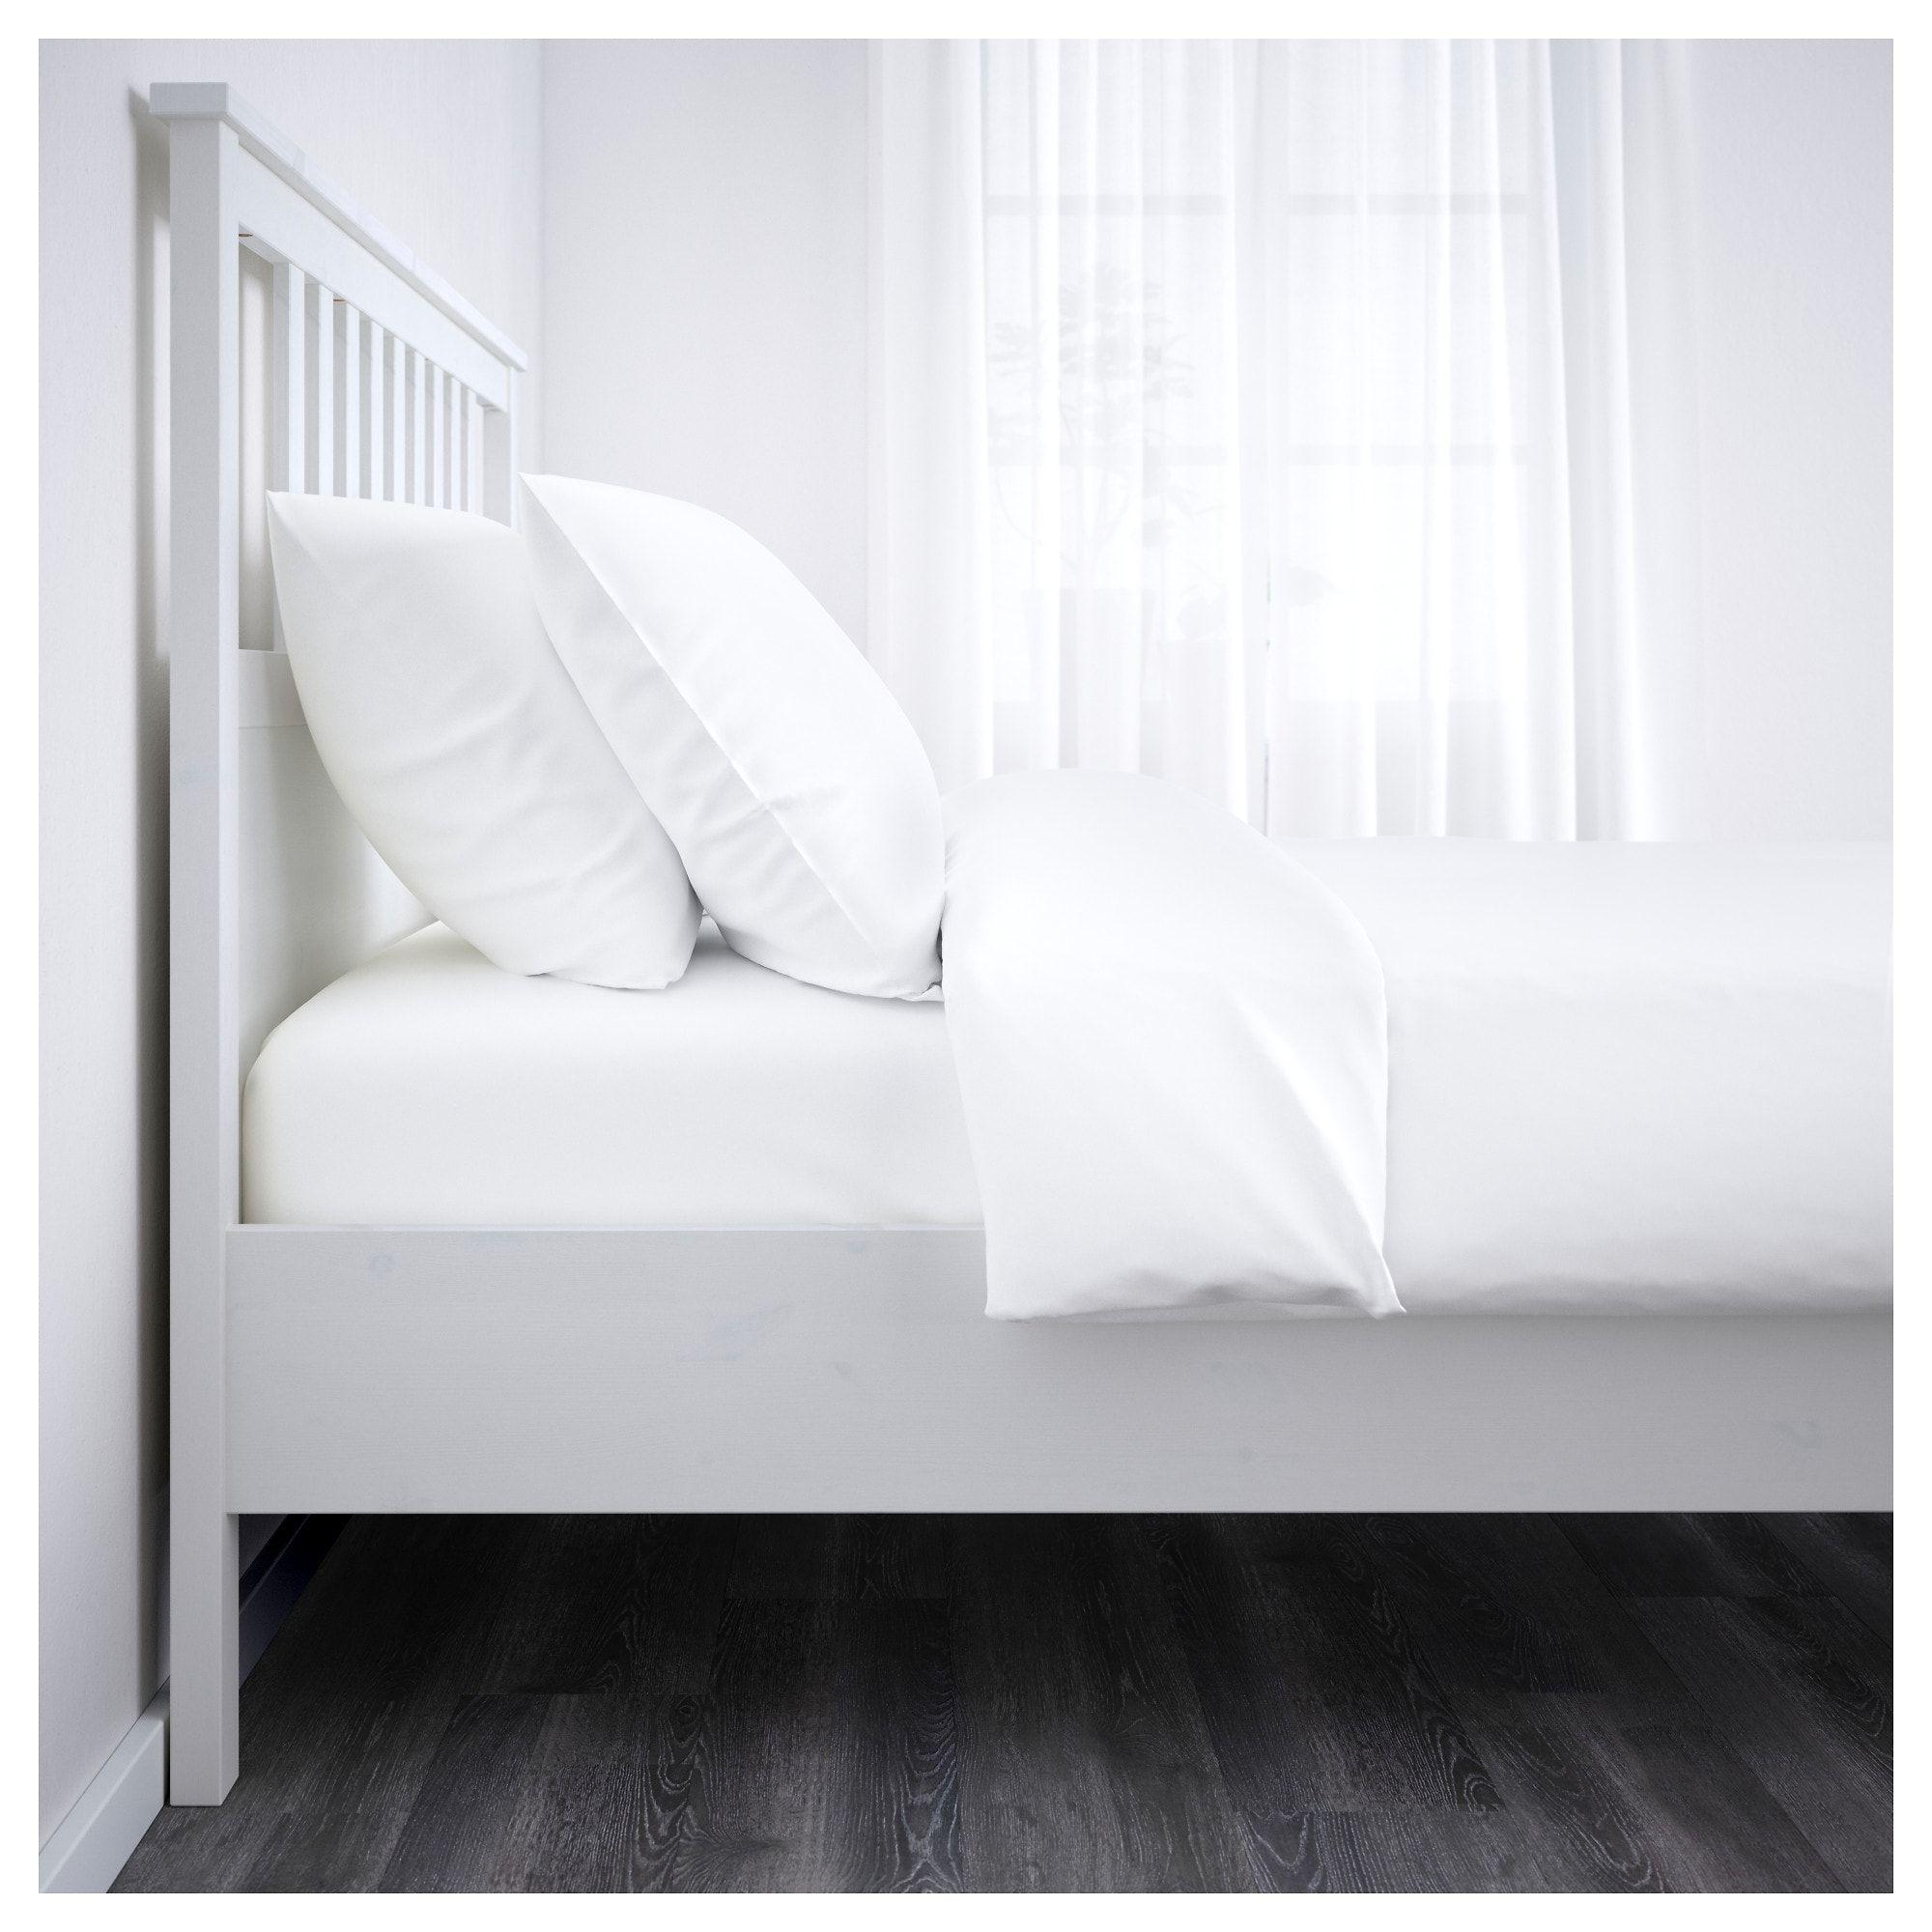 HEMNES Bed frame, white stain, Luröy, Queen IKEA